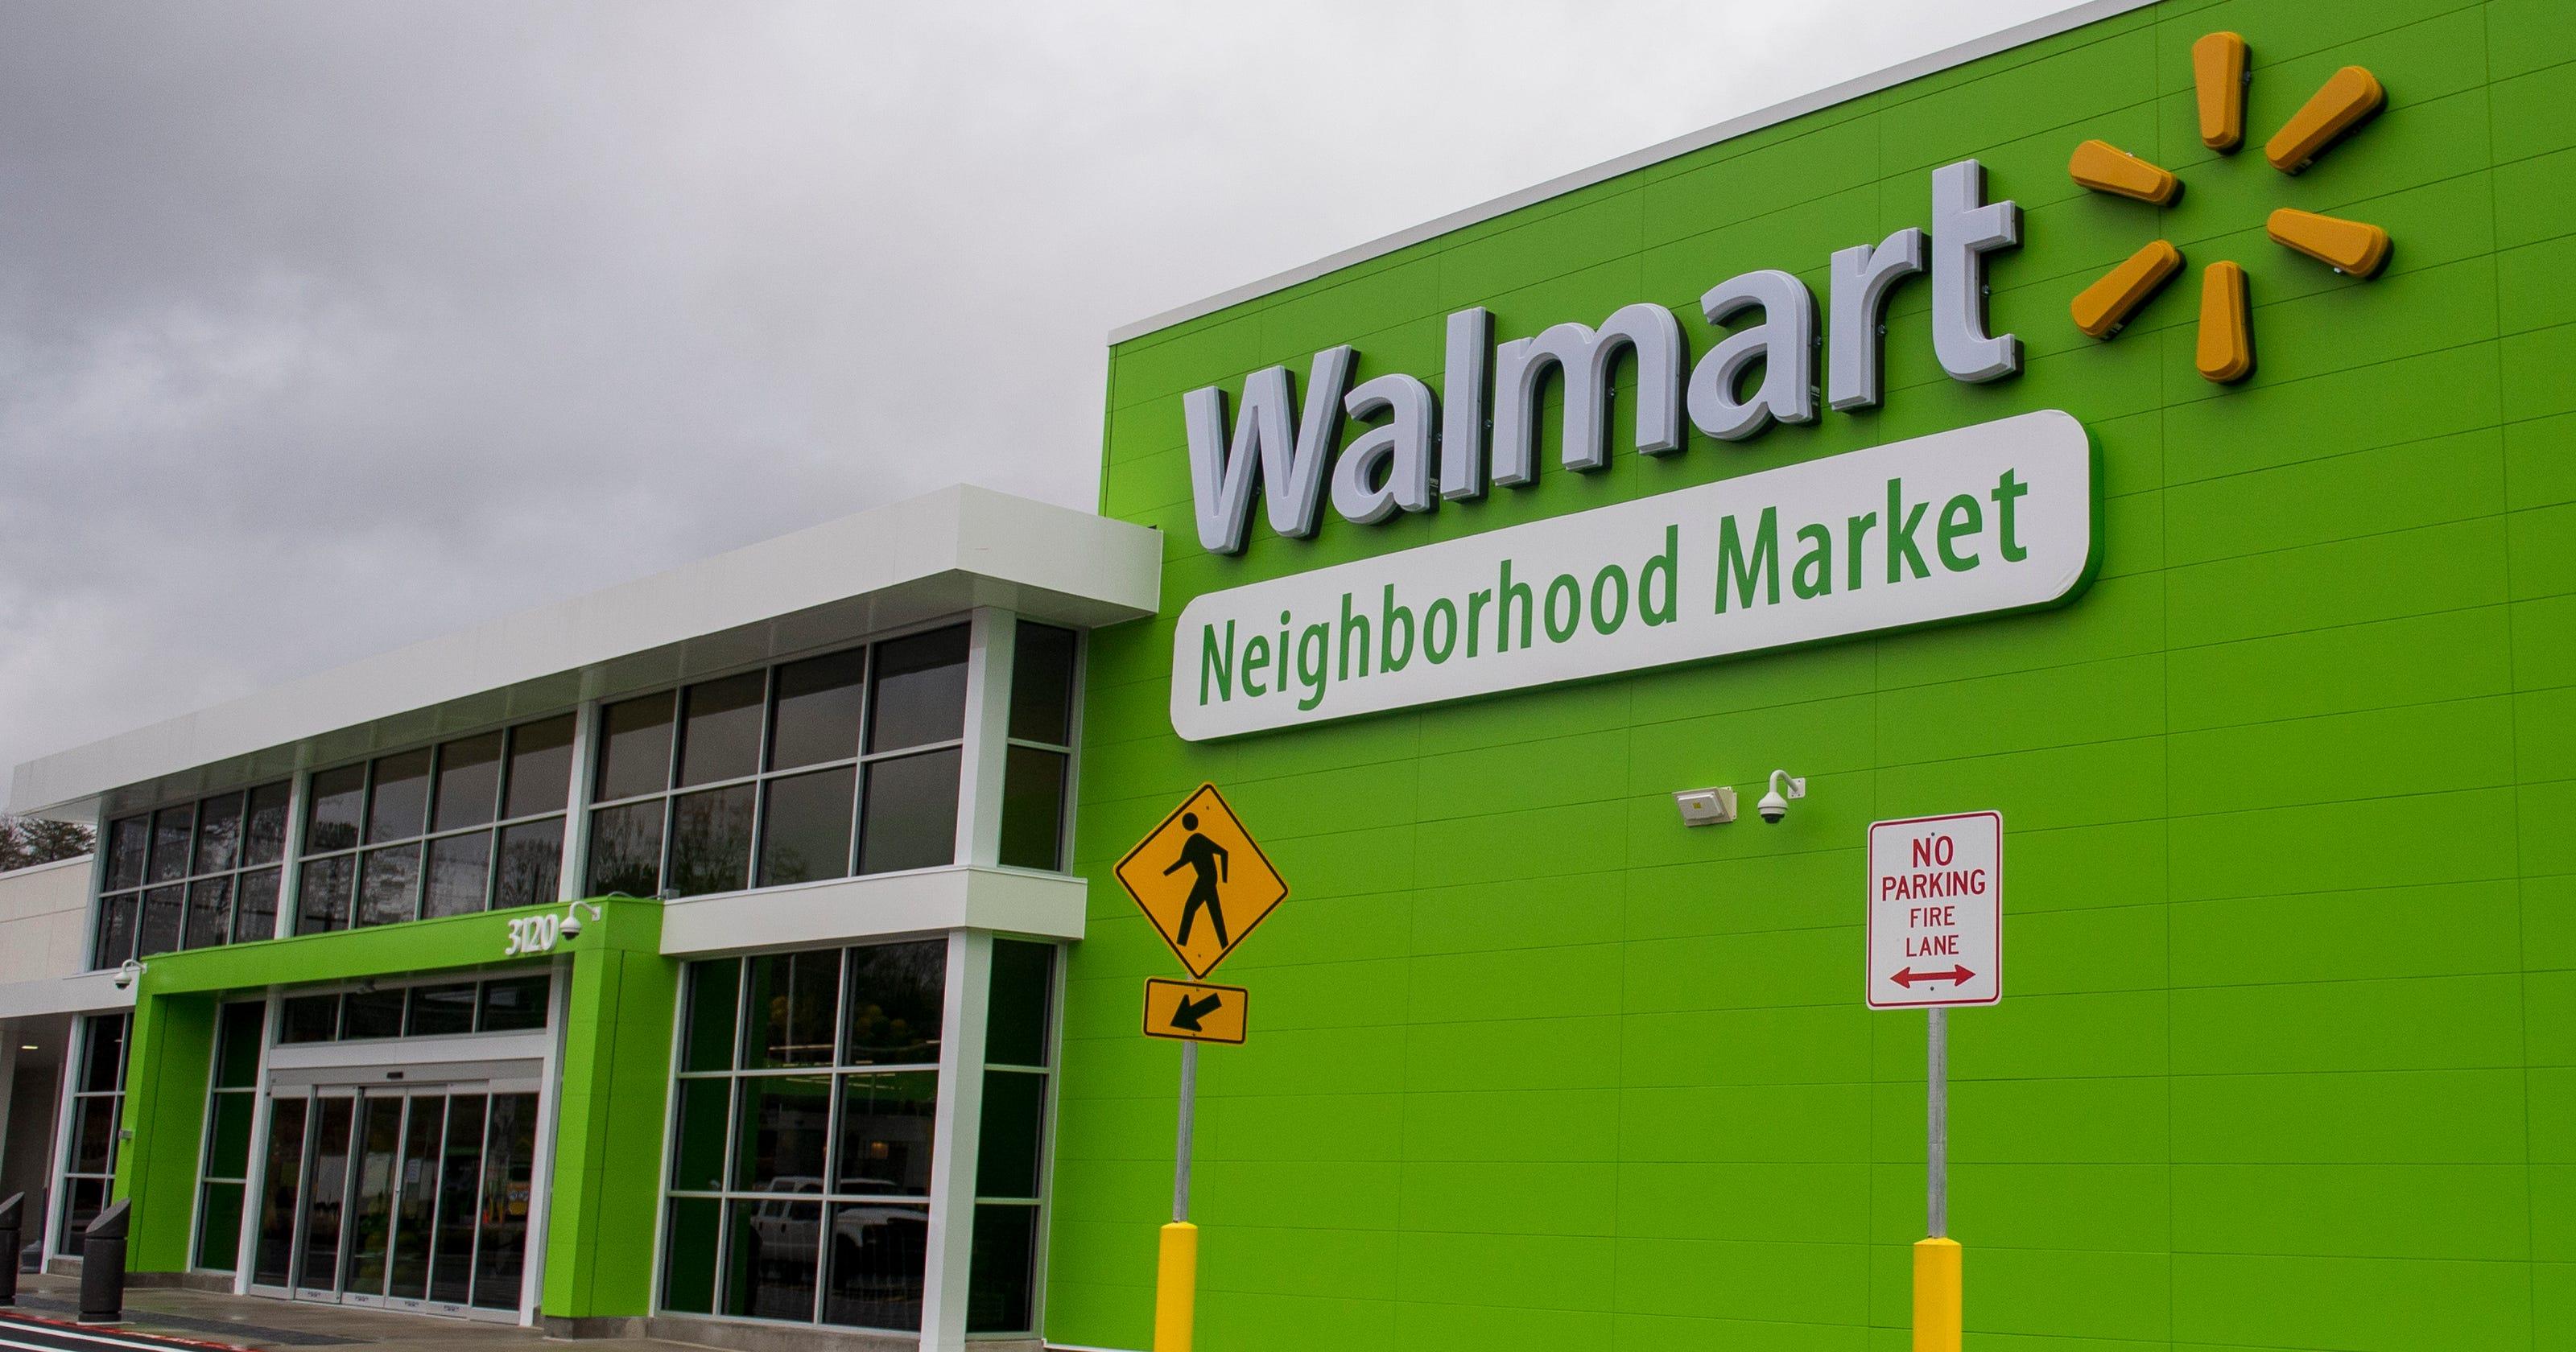 Morristowns Walmart Neighborhood Market Closing In April 77 Jobs Will Be Cut